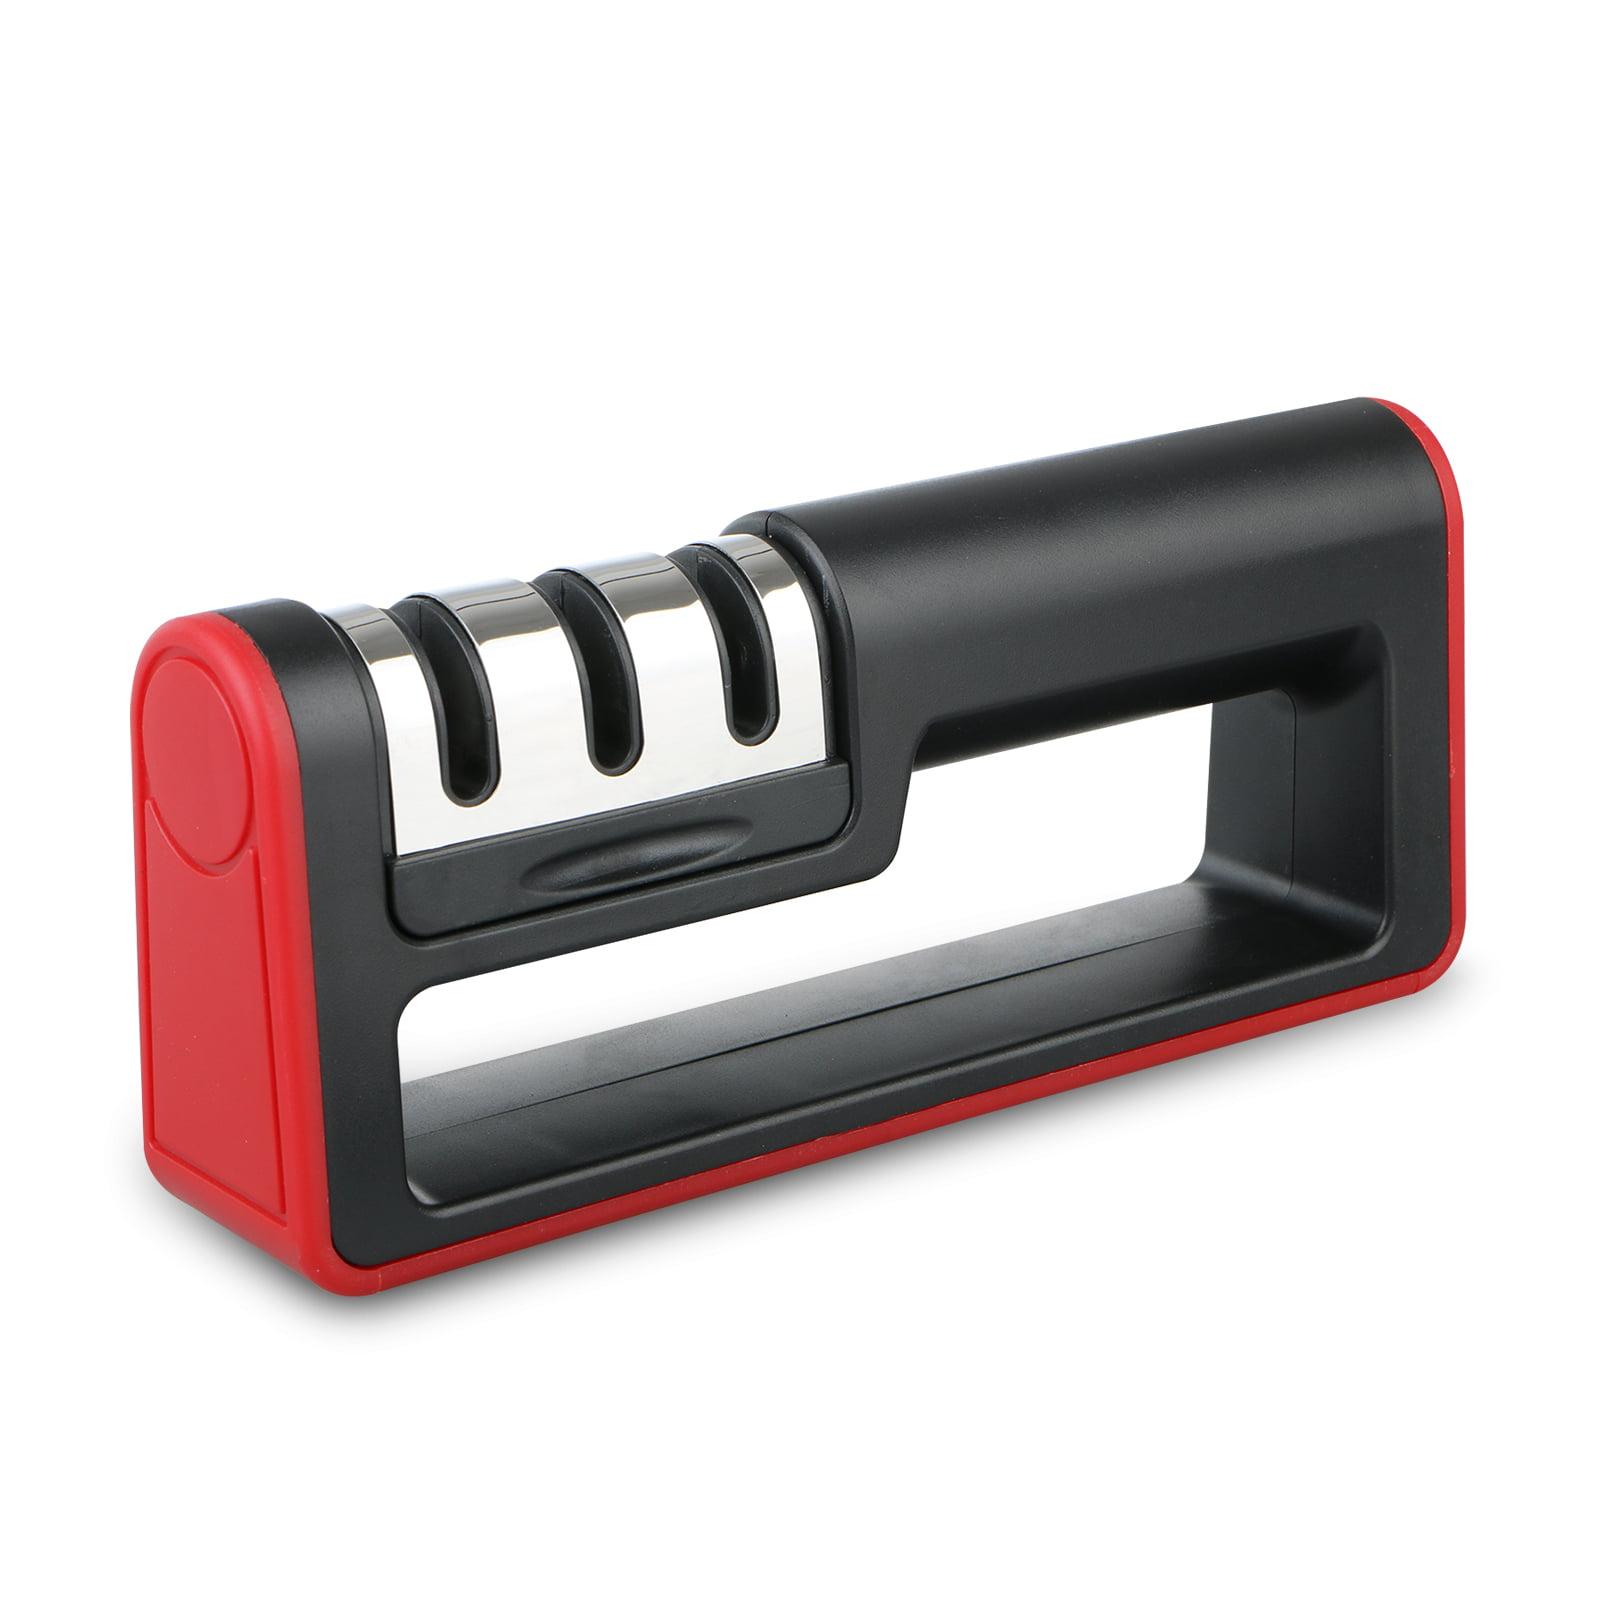 TSV Knife Sharpener Professional Ceramic Tungsten Kitchen Sharpening System Tool